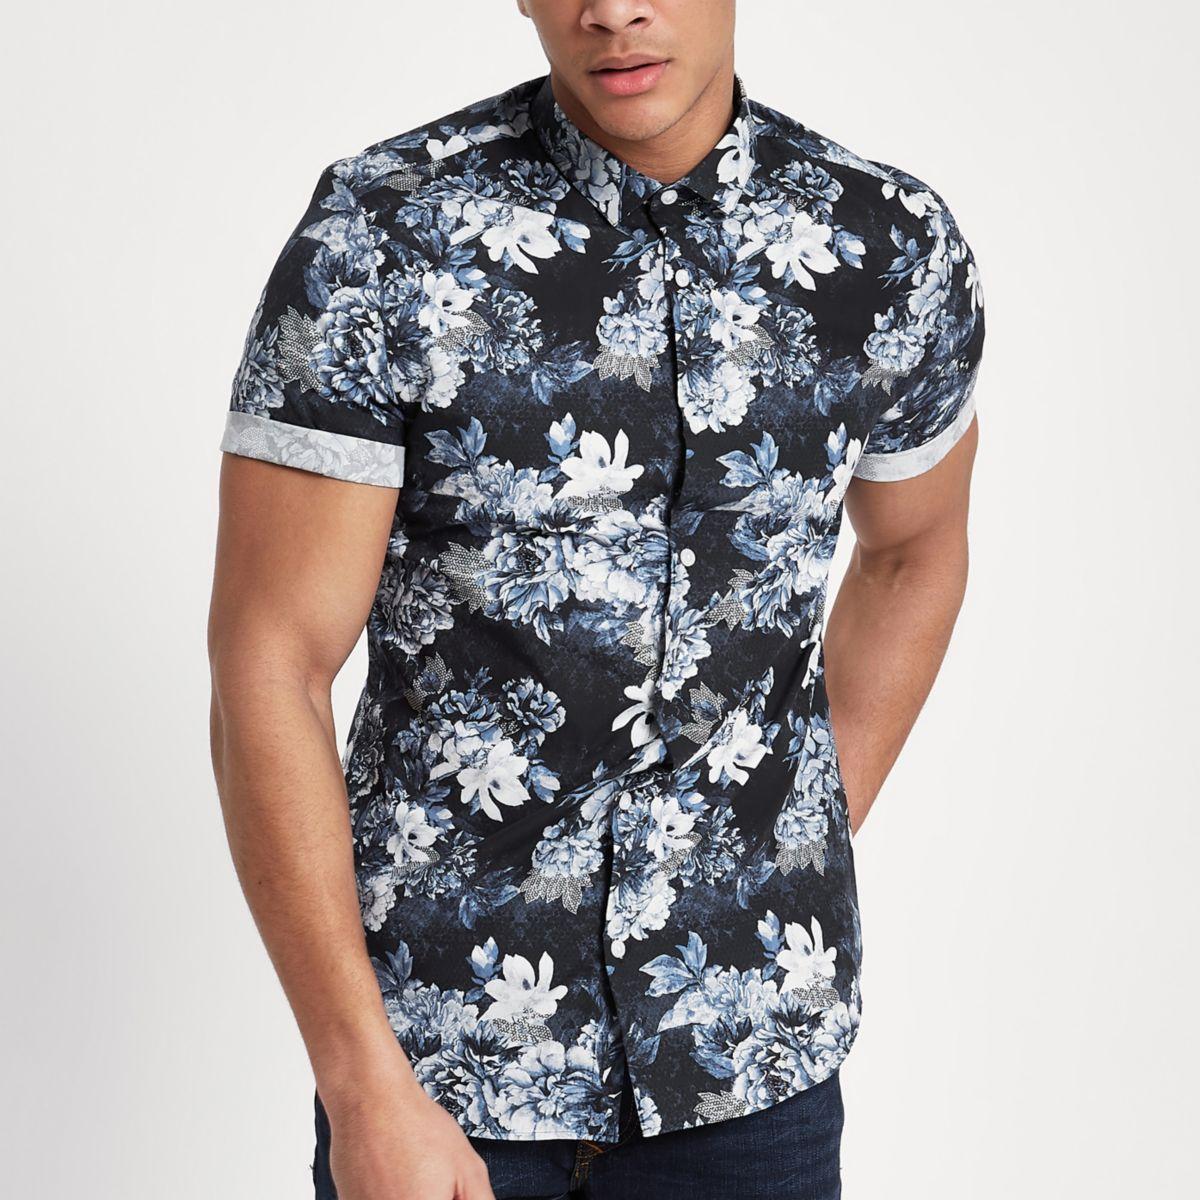 Navy floral slim fit short sleeve shirt